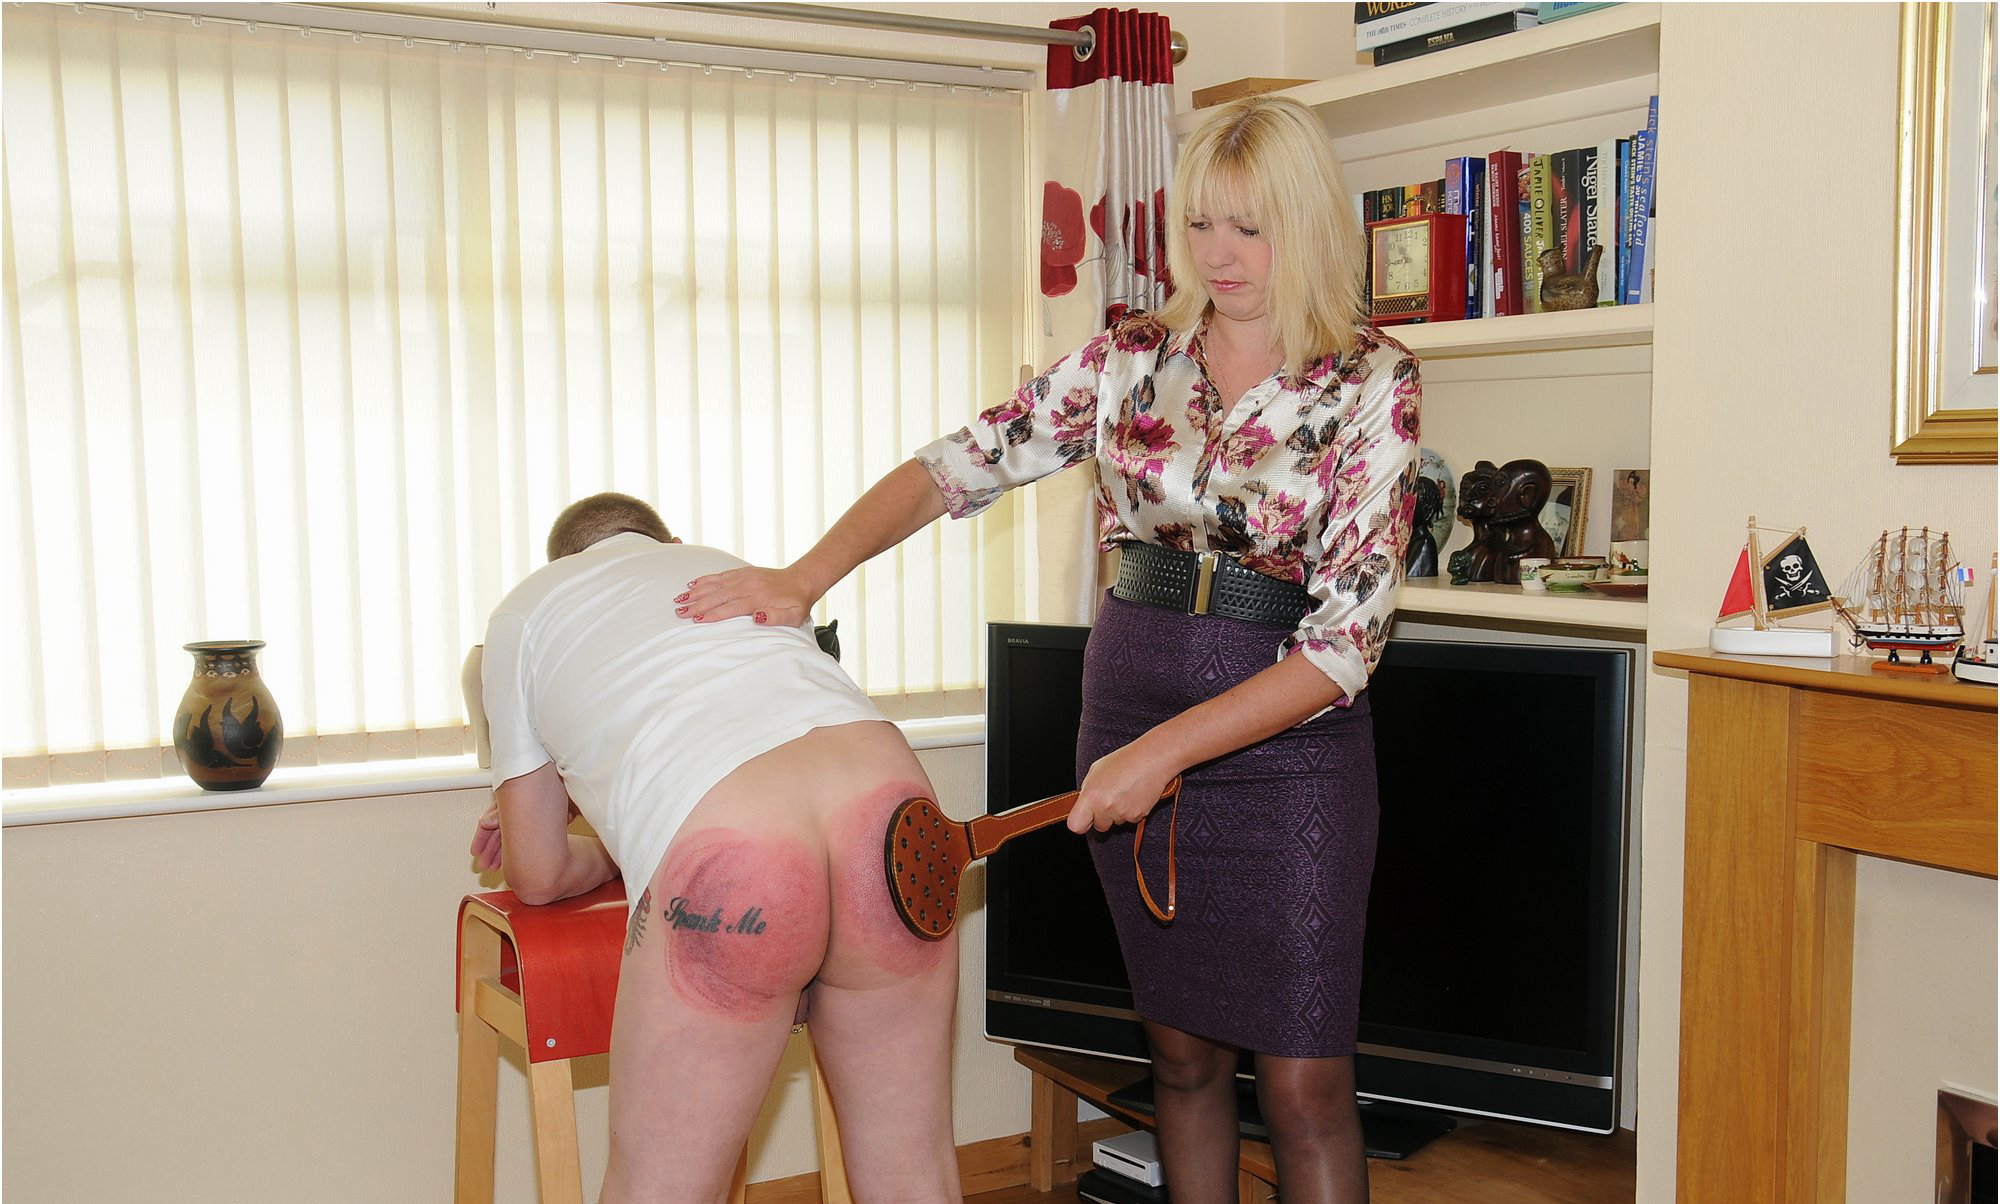 brutal-spanking-3